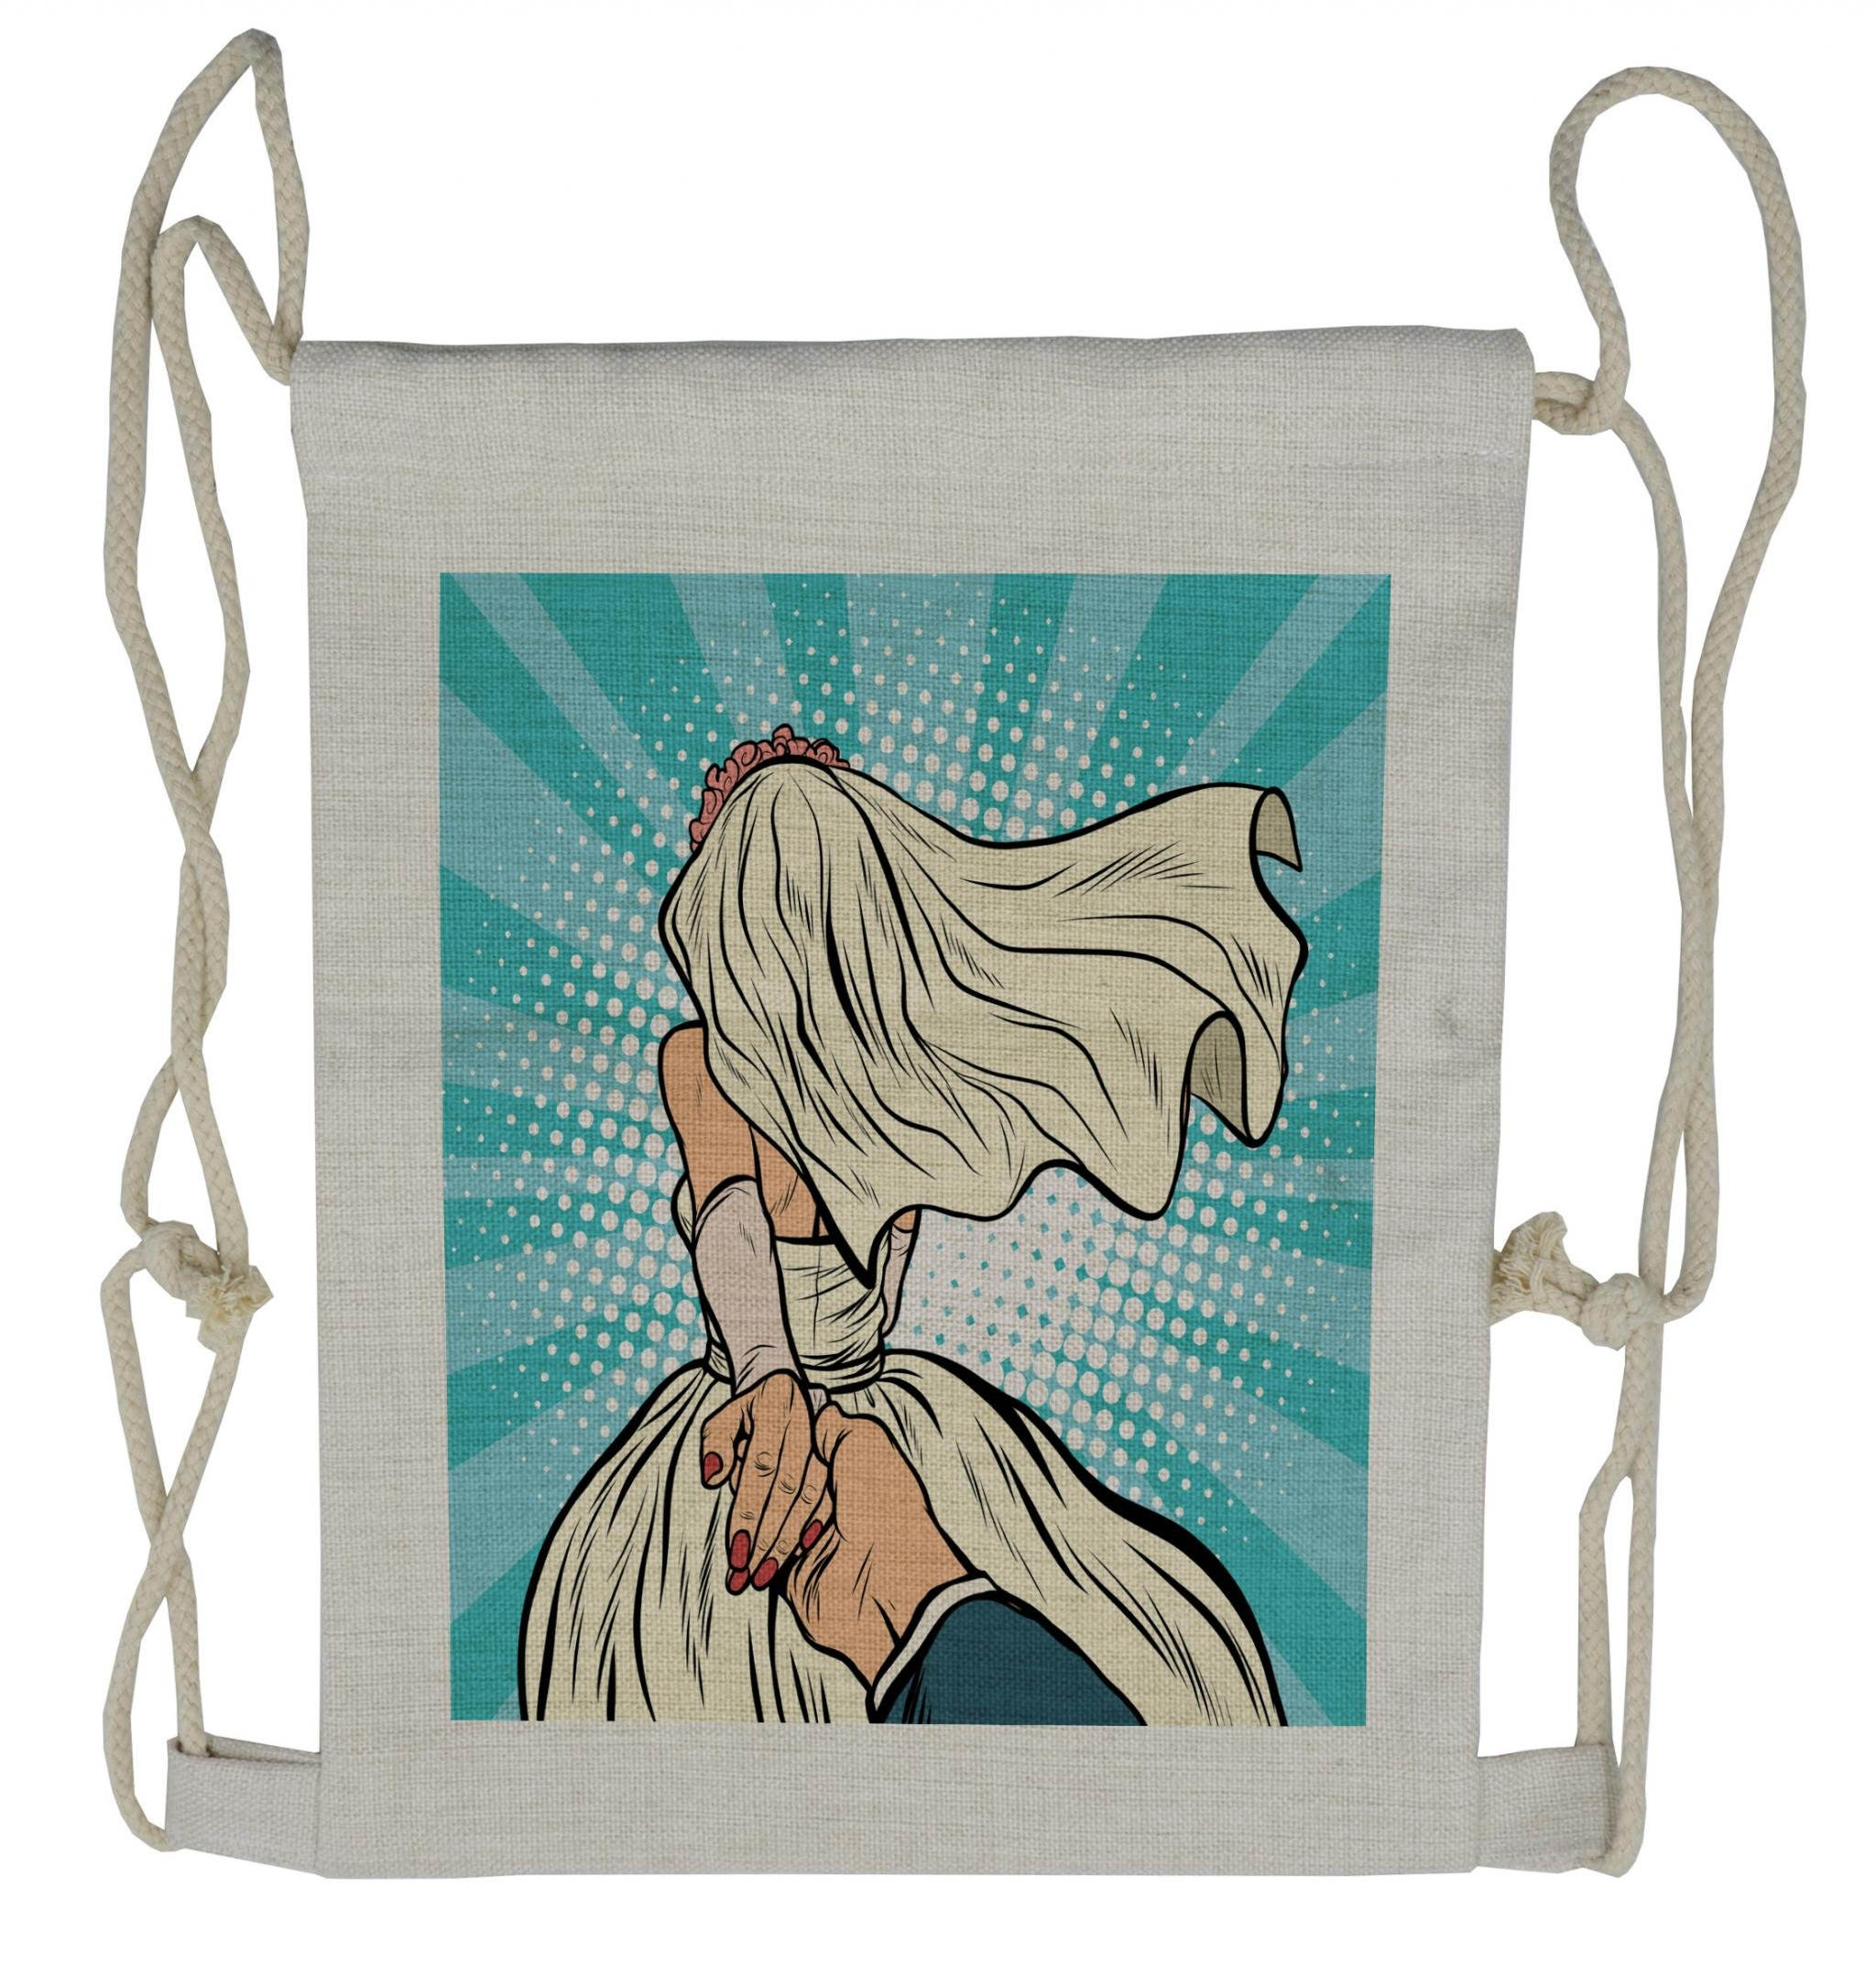 Lunarable Art Drawstring Backpack, Wedding Theme Bride and Groom, Sackpack Bag